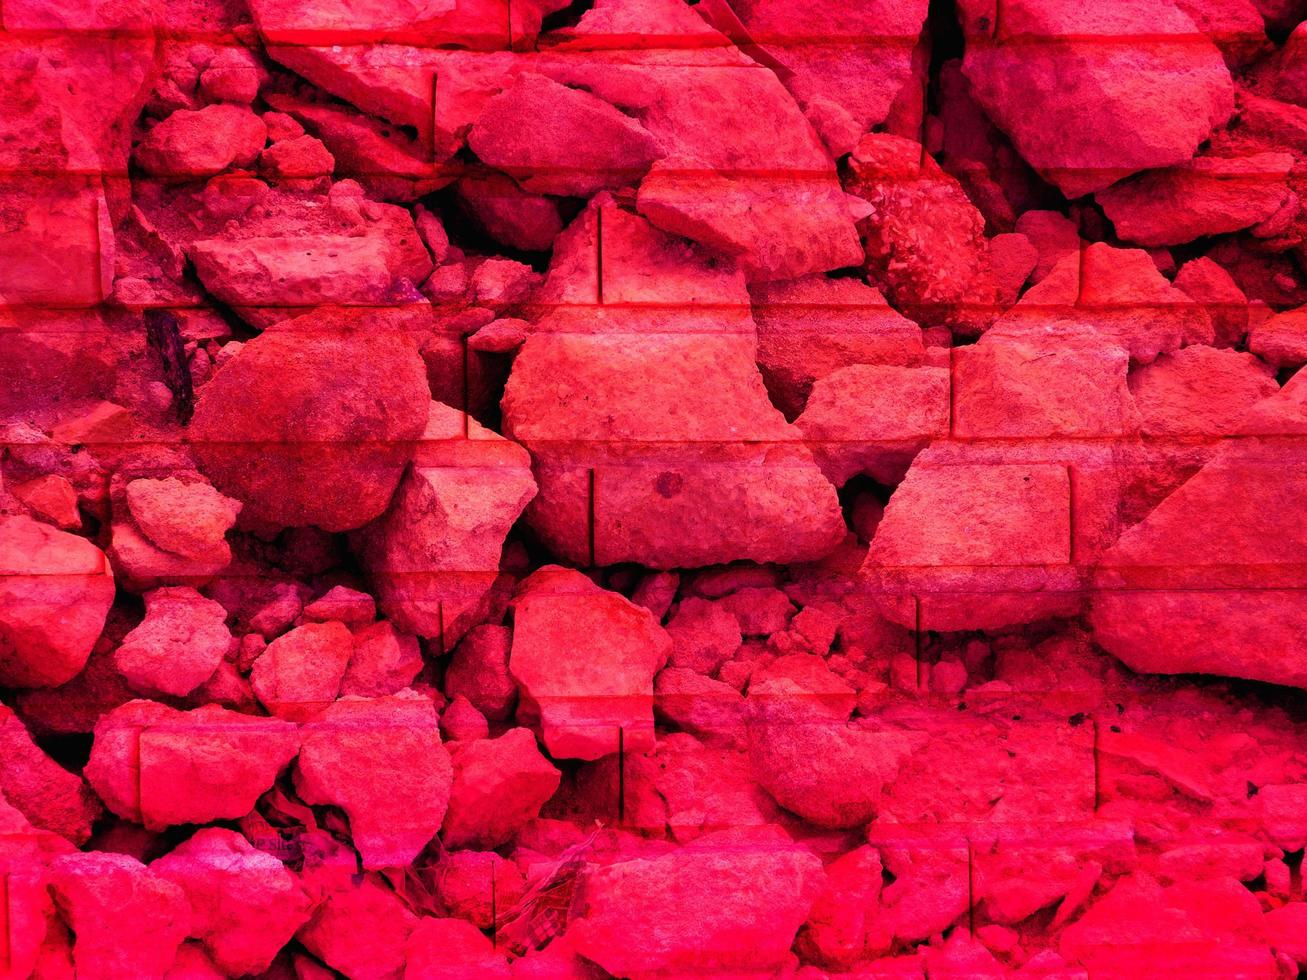 paarse steen textuur foto